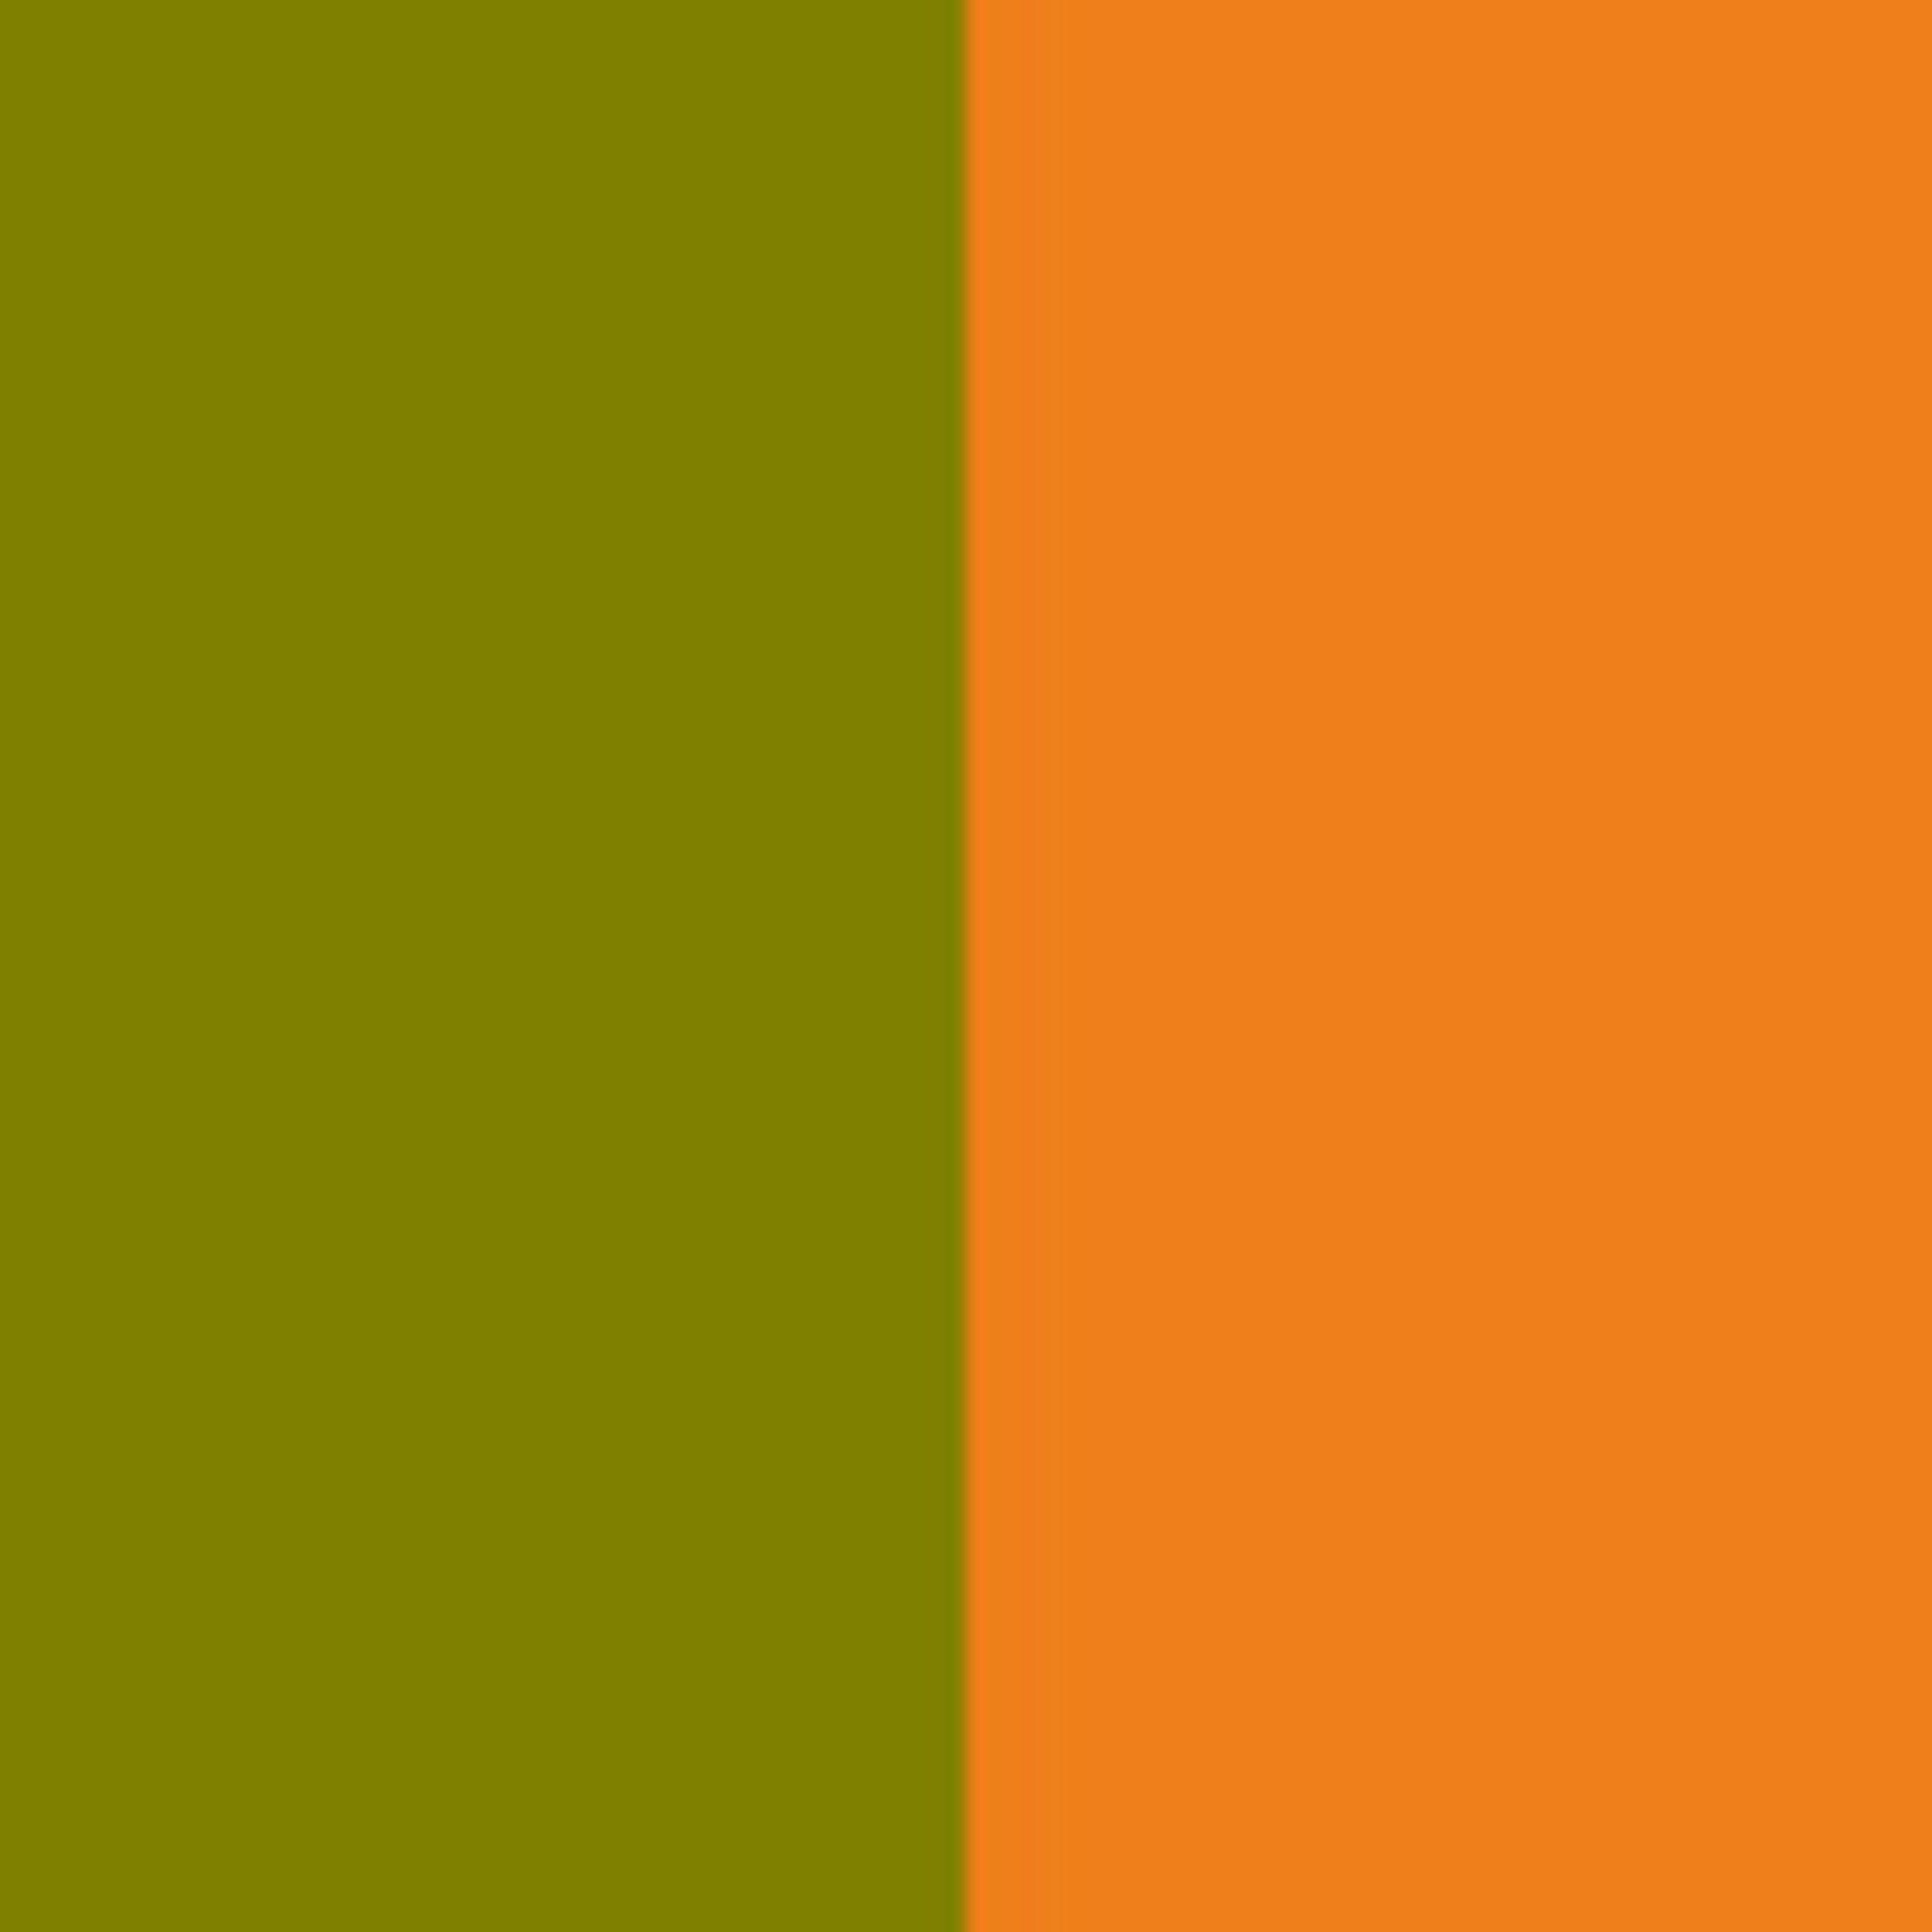 Oliv/orange